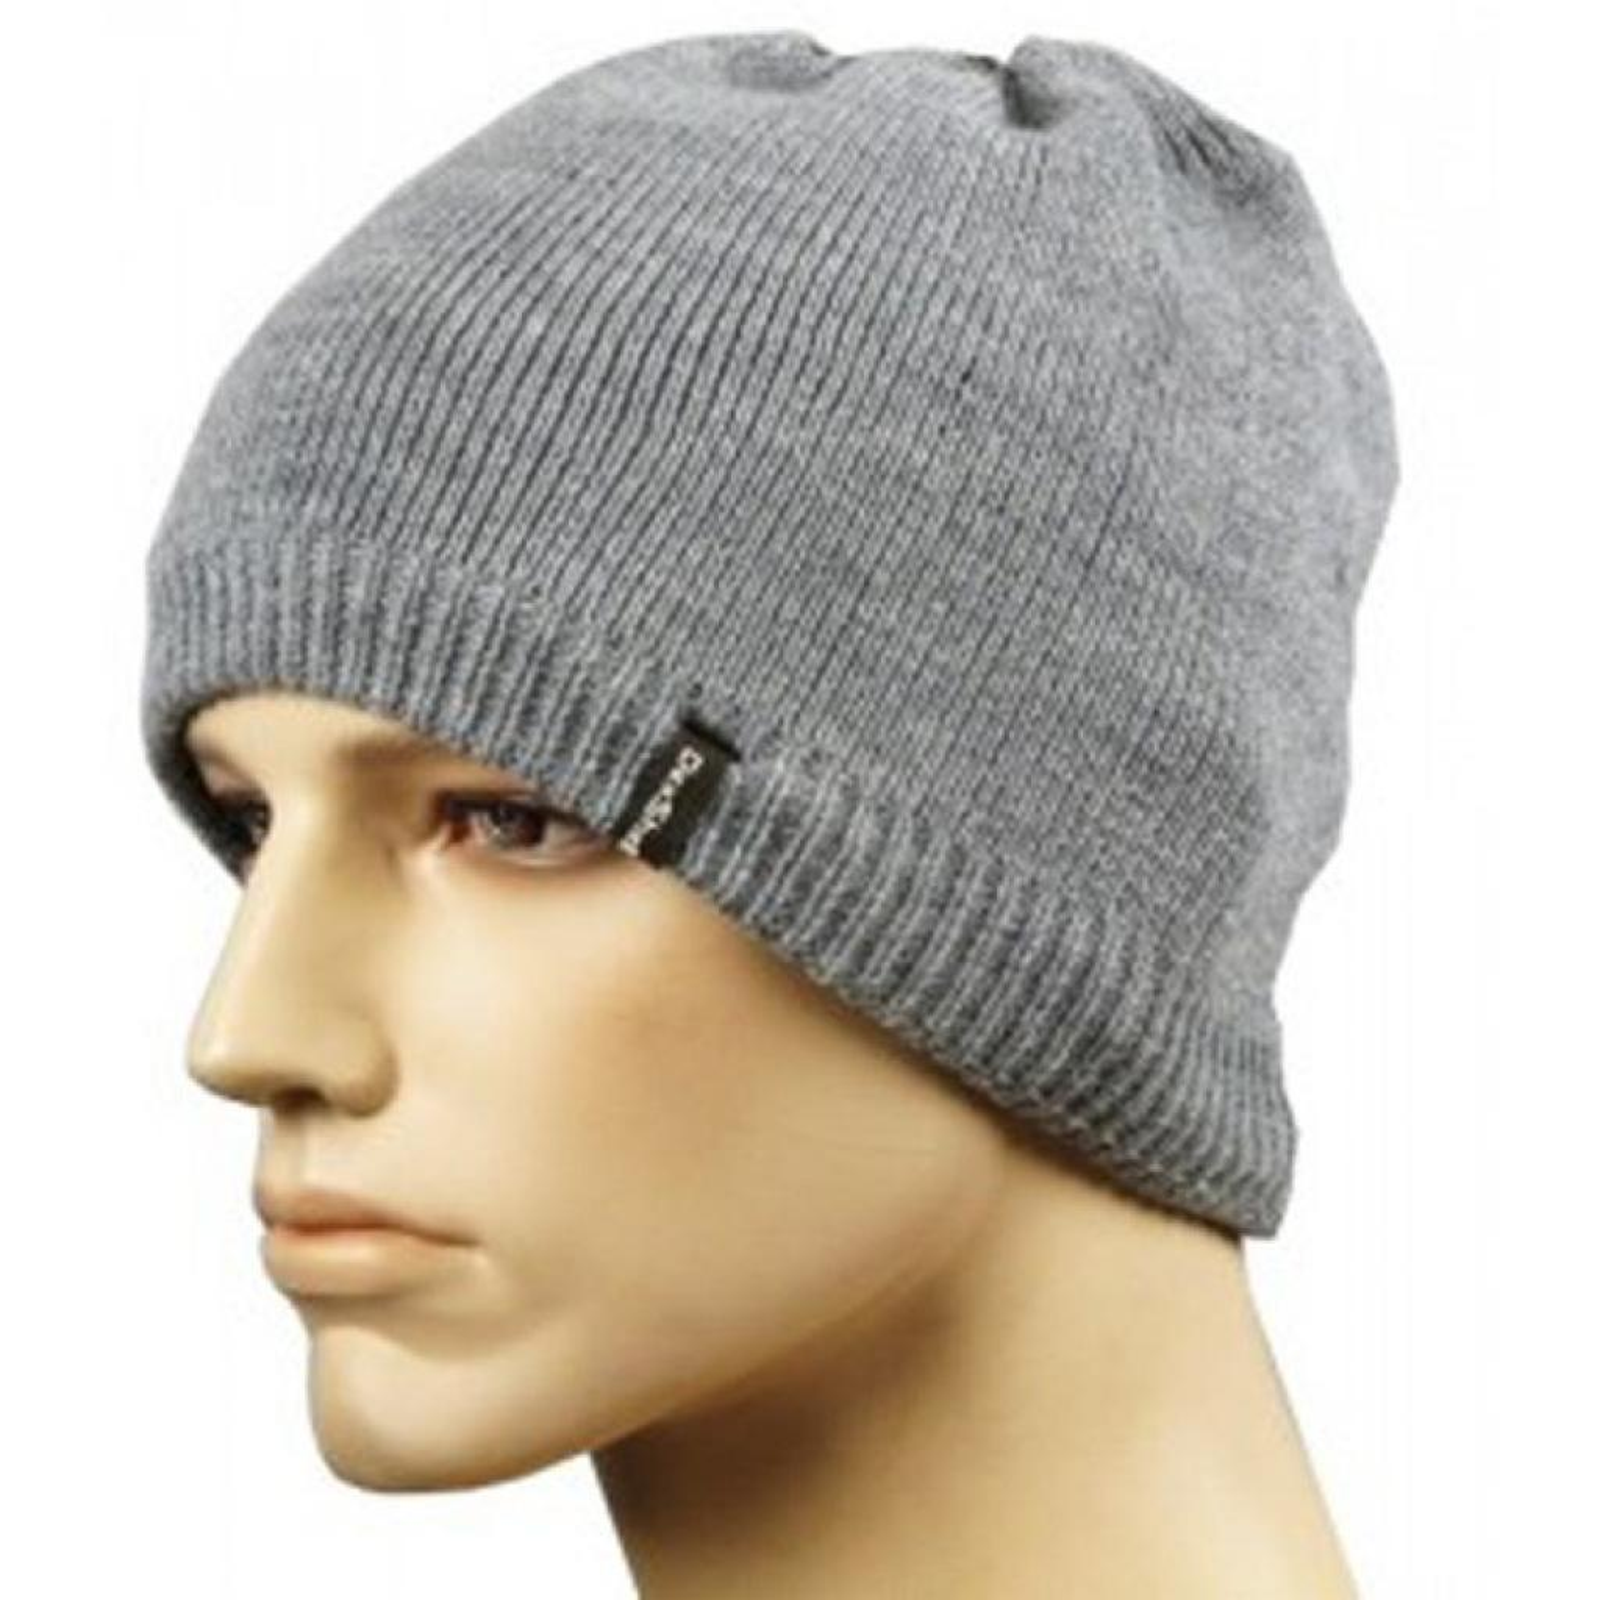 Водонепроницаемая шапка Dexshell DH372-NBSM изображение 3